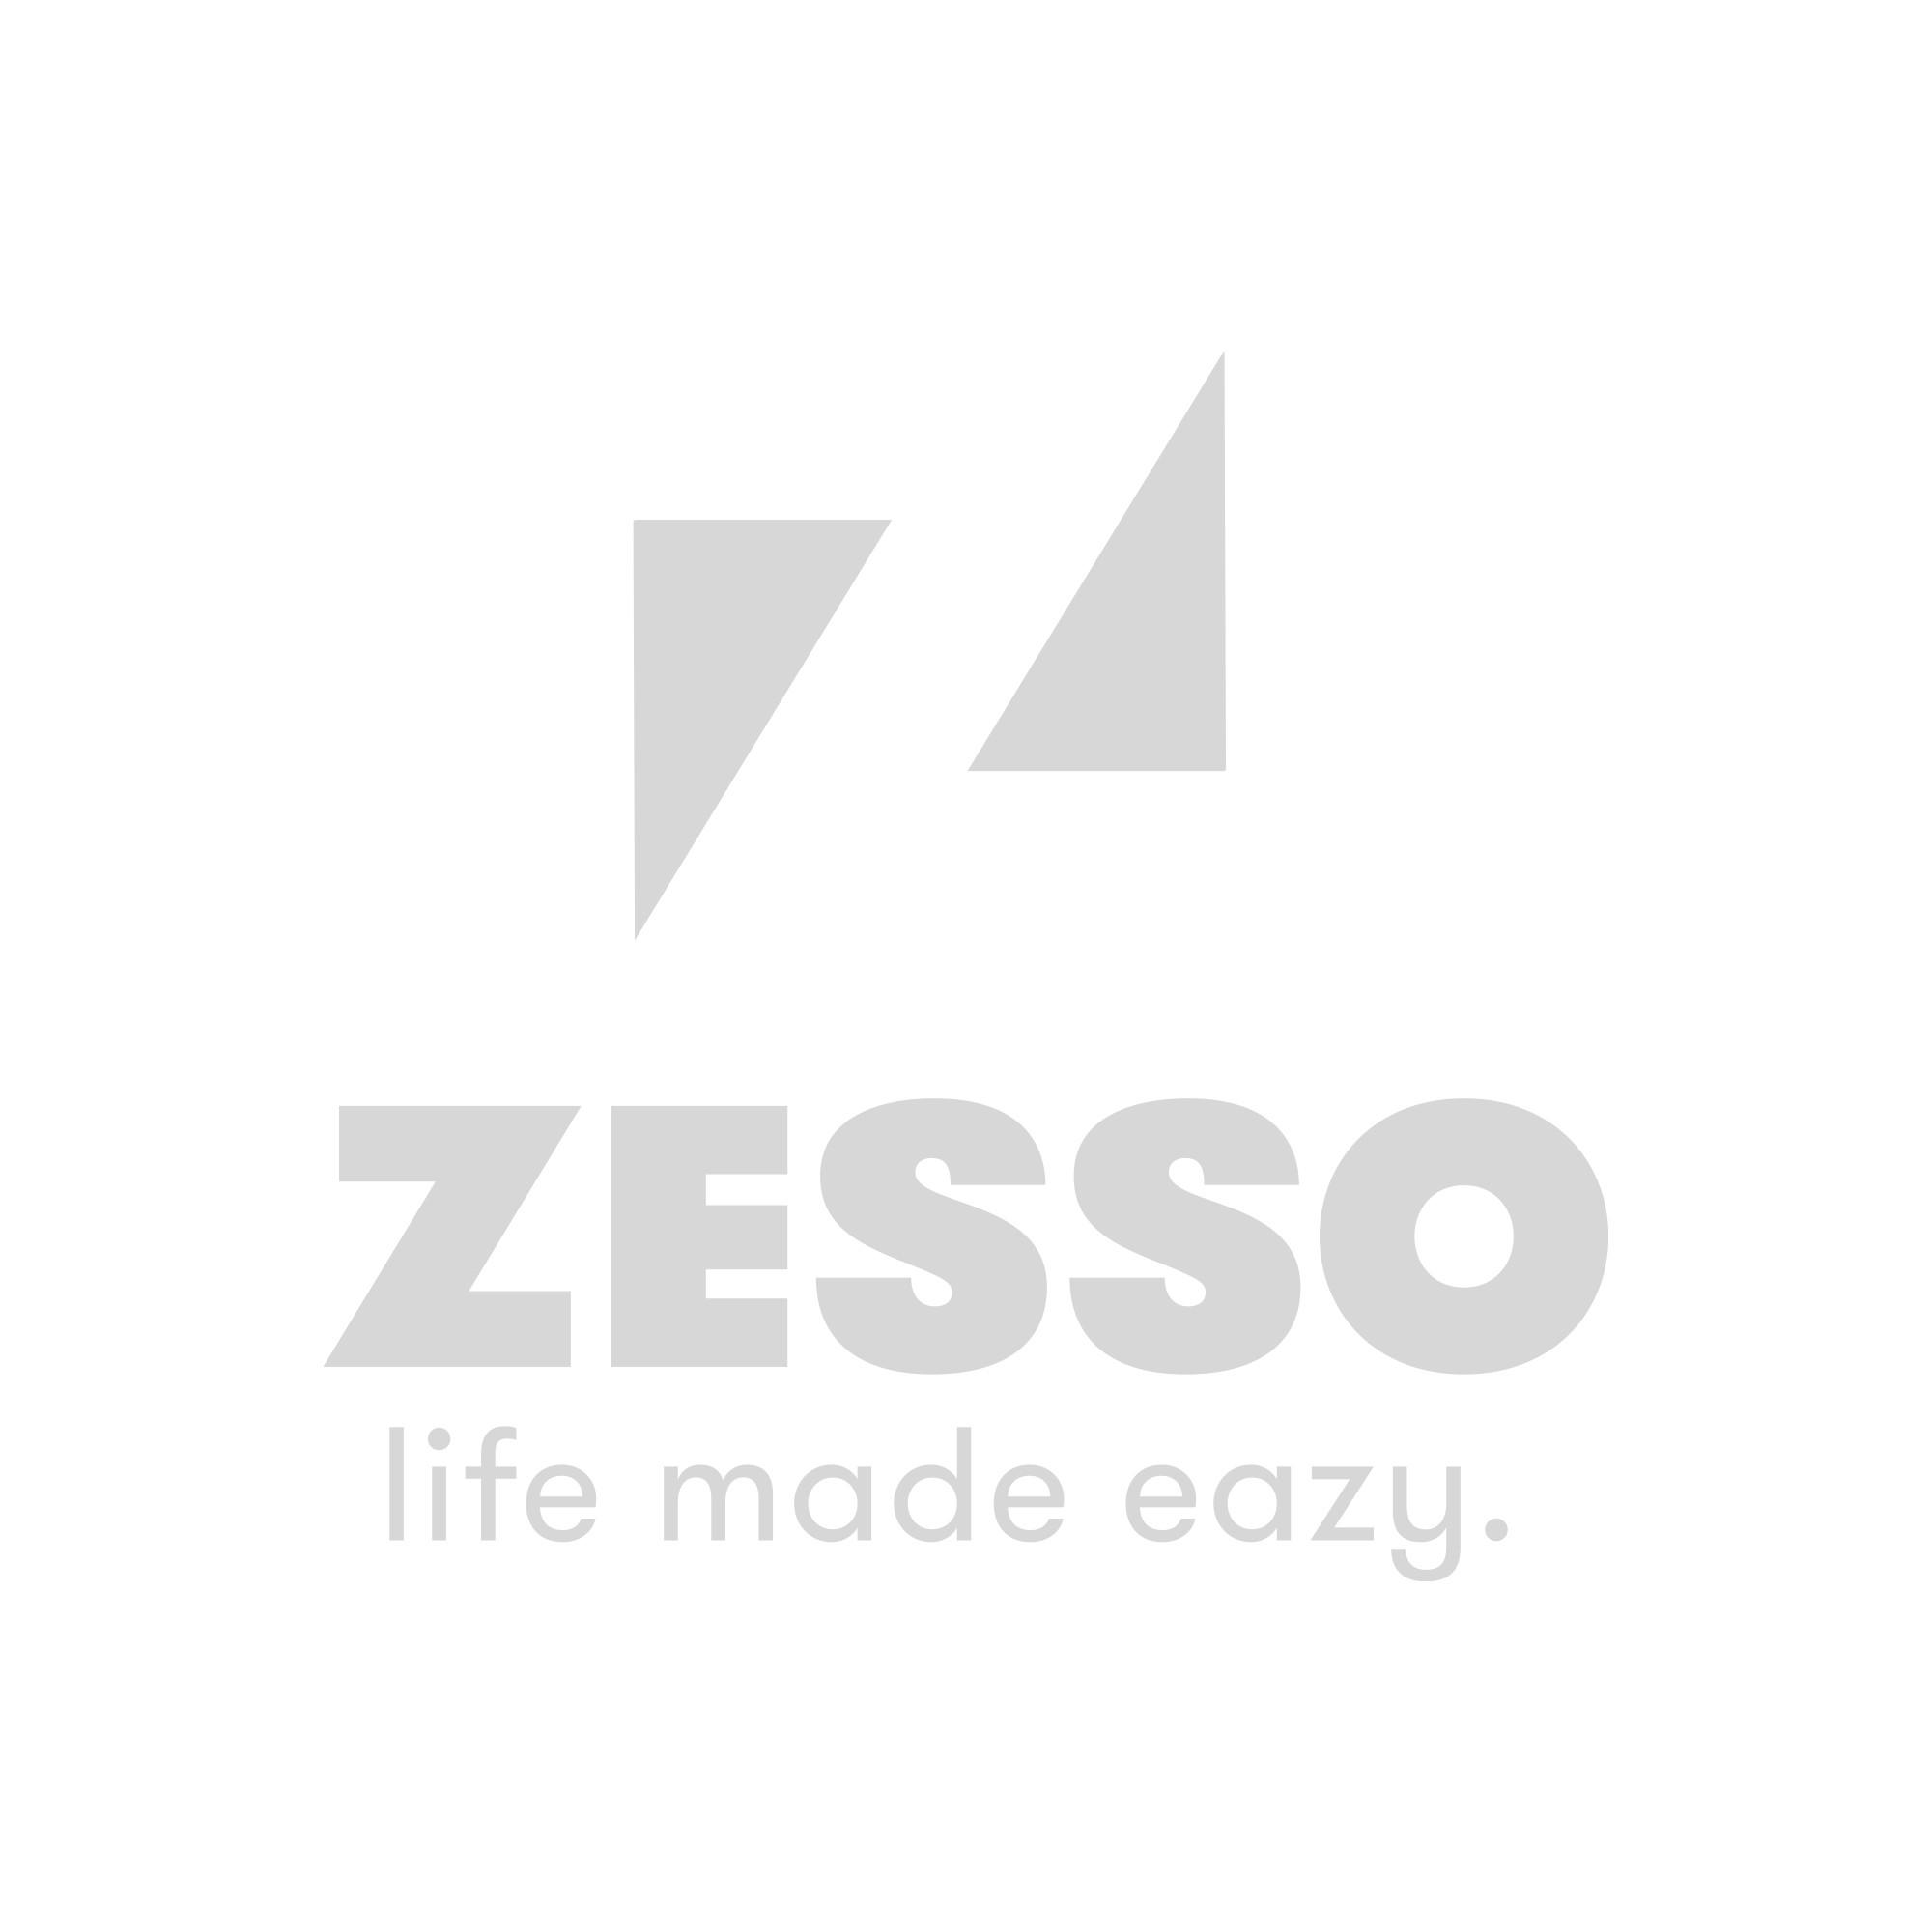 Baytex Canvas Poster Set Pink Holidays 30 cm x 40 cm - 3 Stuks